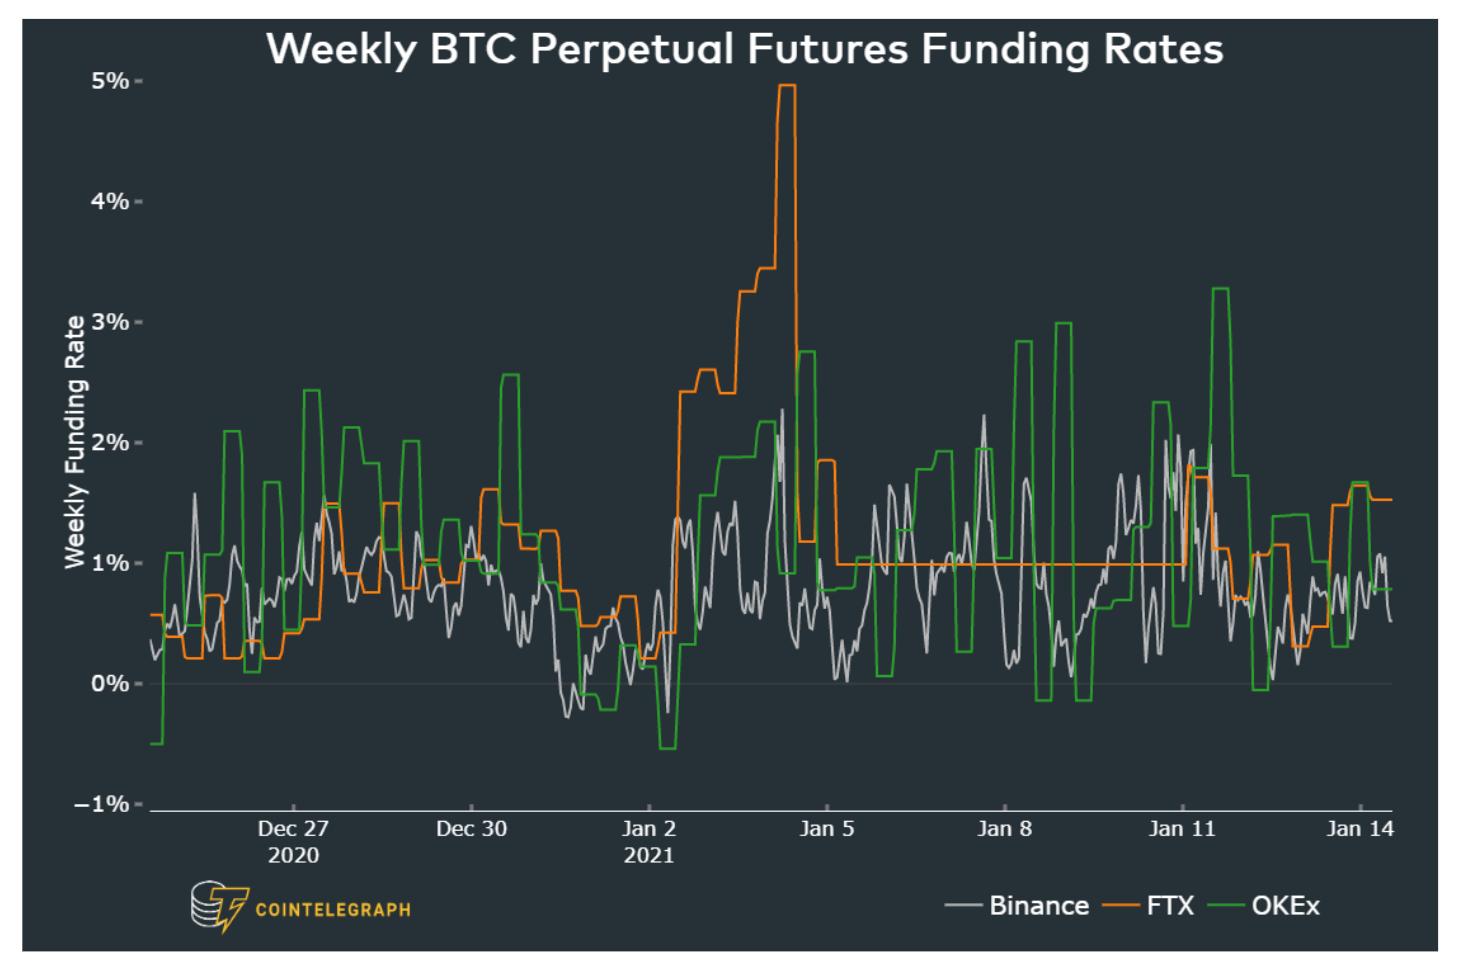 $13B Bitcoin futures open interest reflects traders' strong bullish optimism